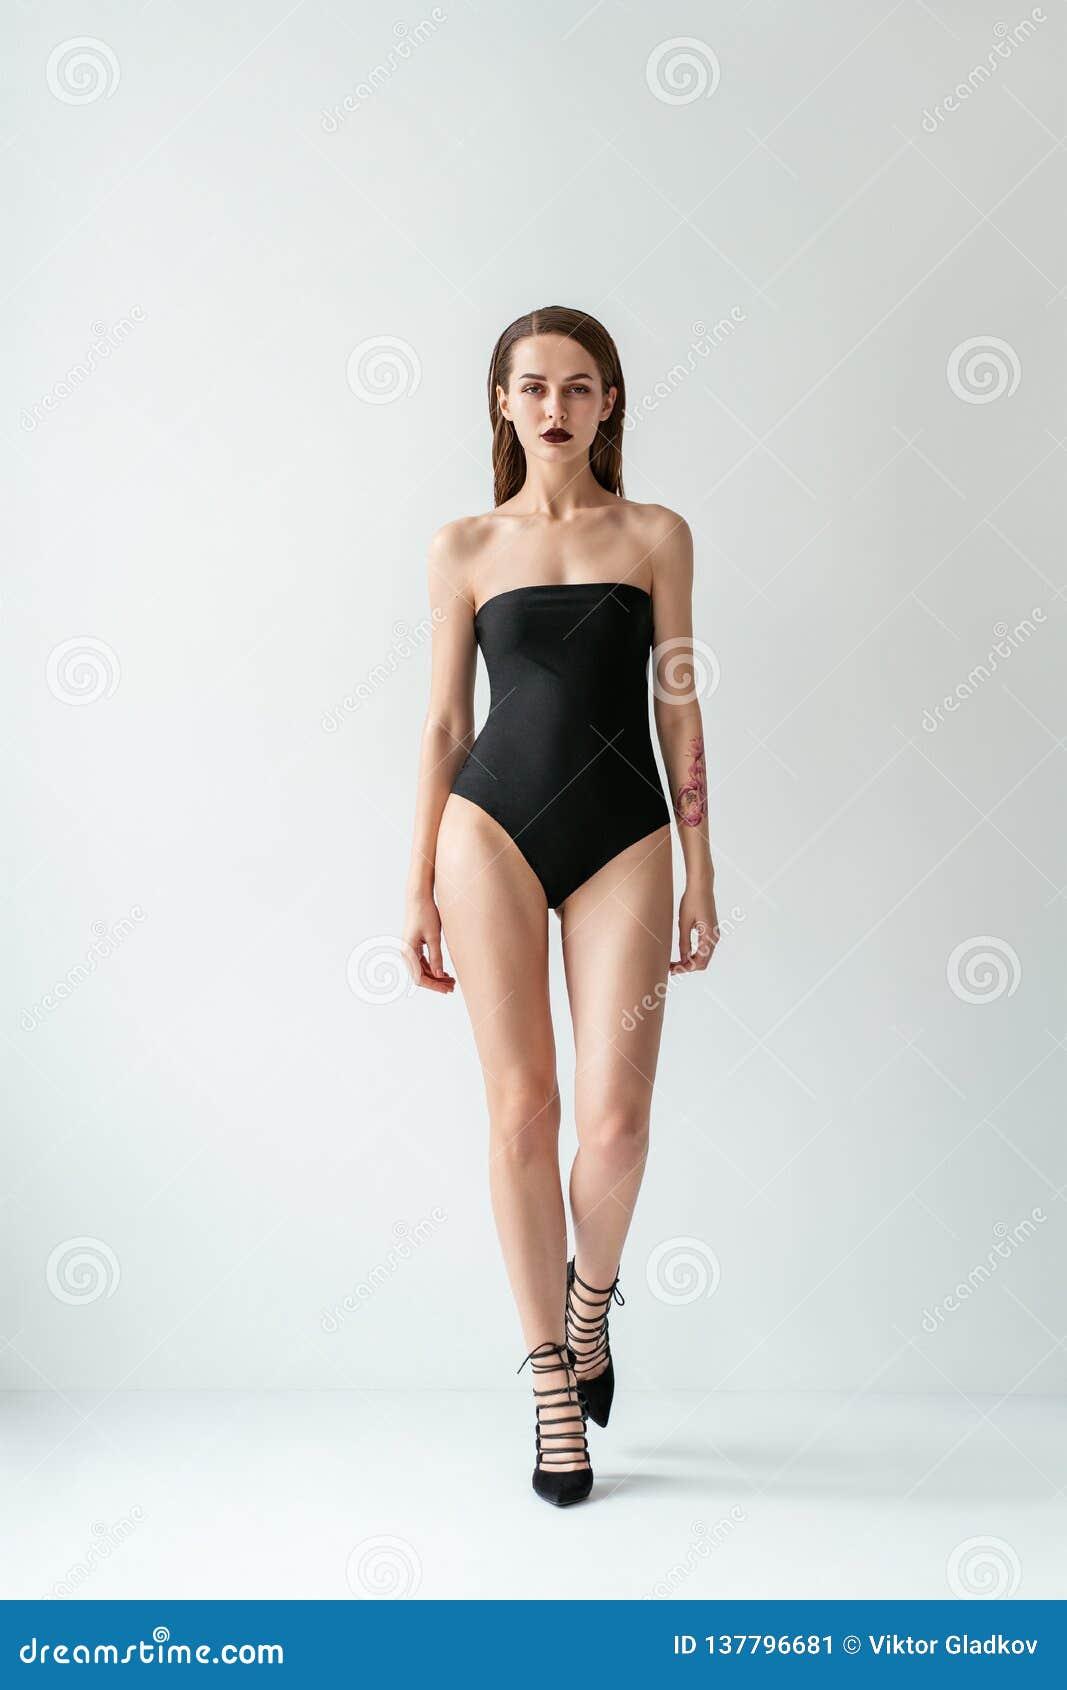 Full length portrait of walking beautiful girl in black swimsuit